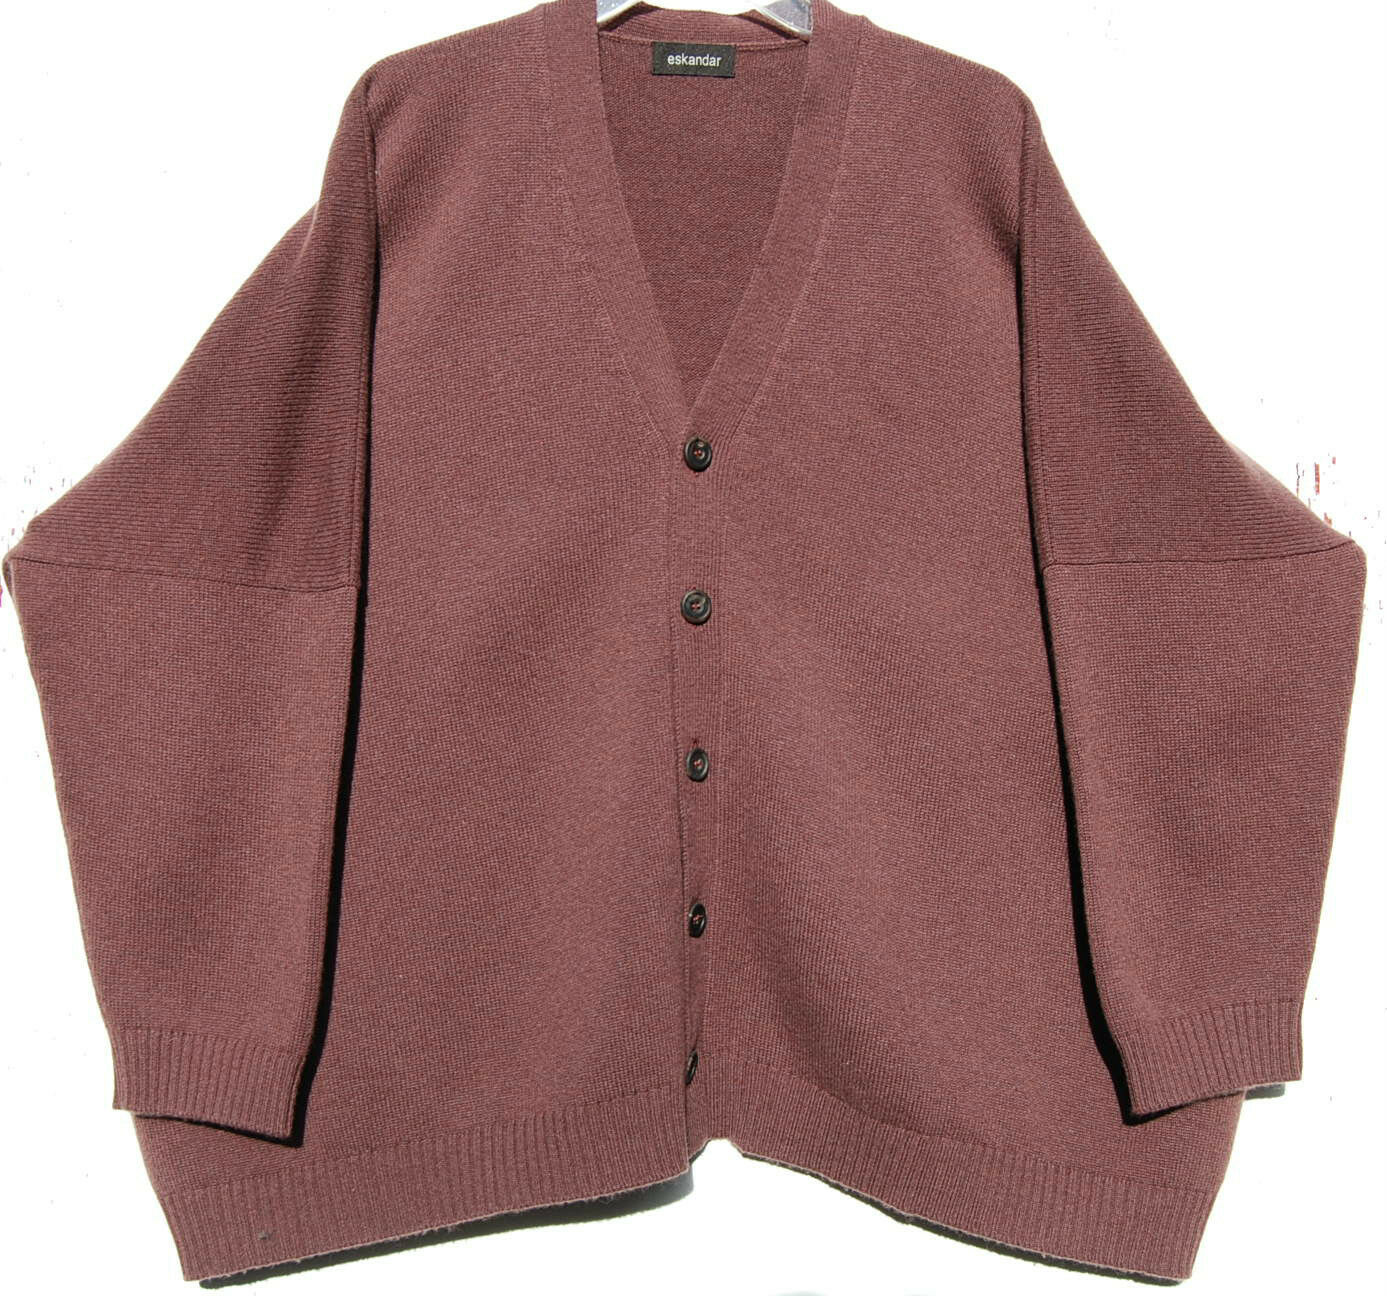 Eskandar PLUM Medium to Heavy Weight Cashmere V-Neck Boxy Cardigan O S  2190